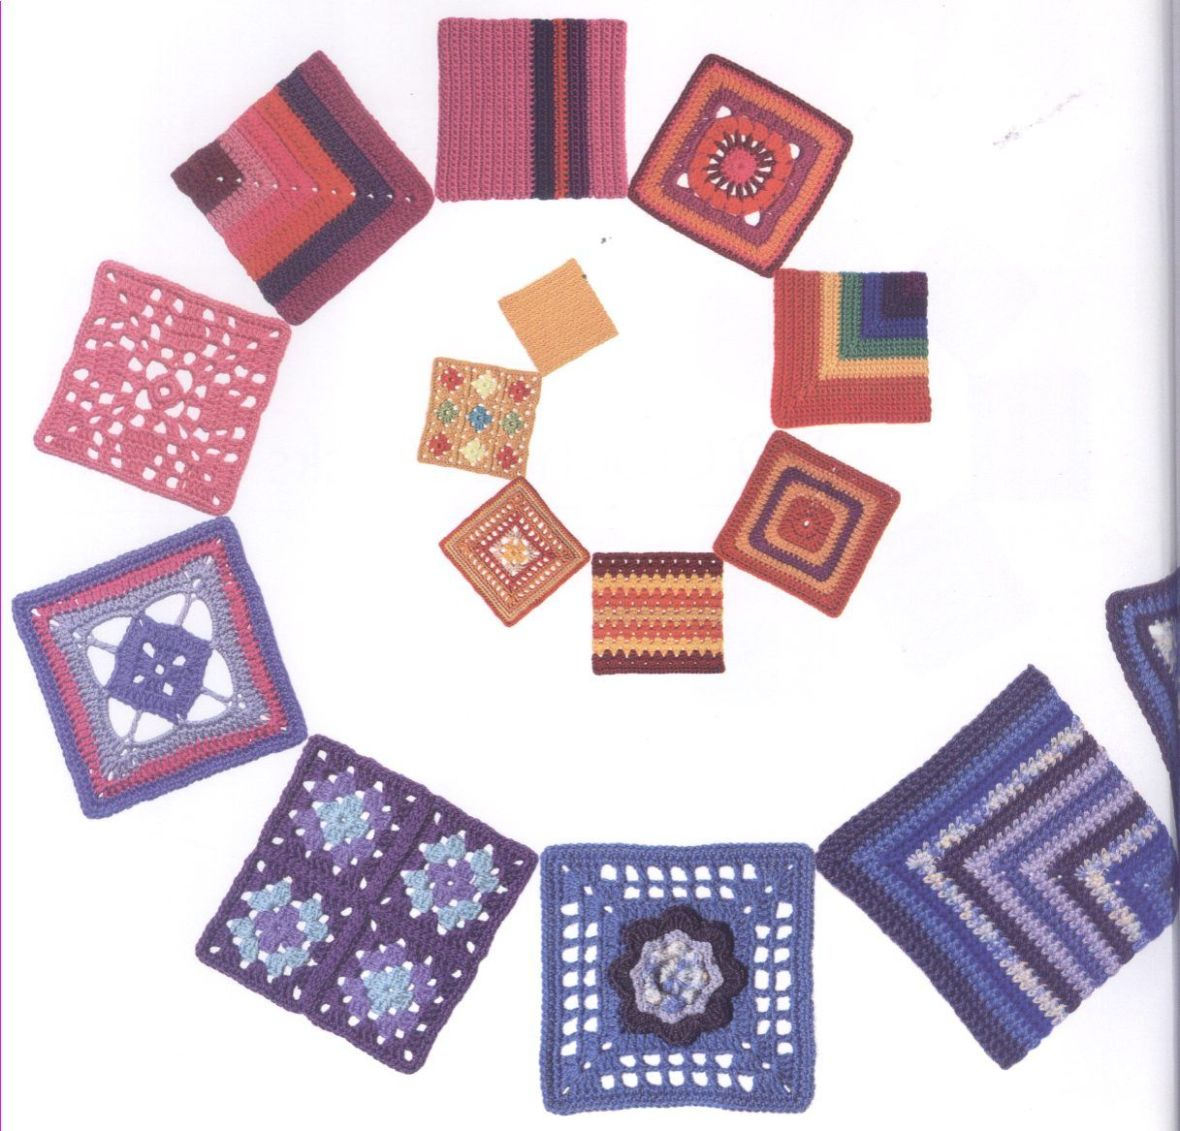 200 Crocheted Blocks for blankets, throws & Afghans 002